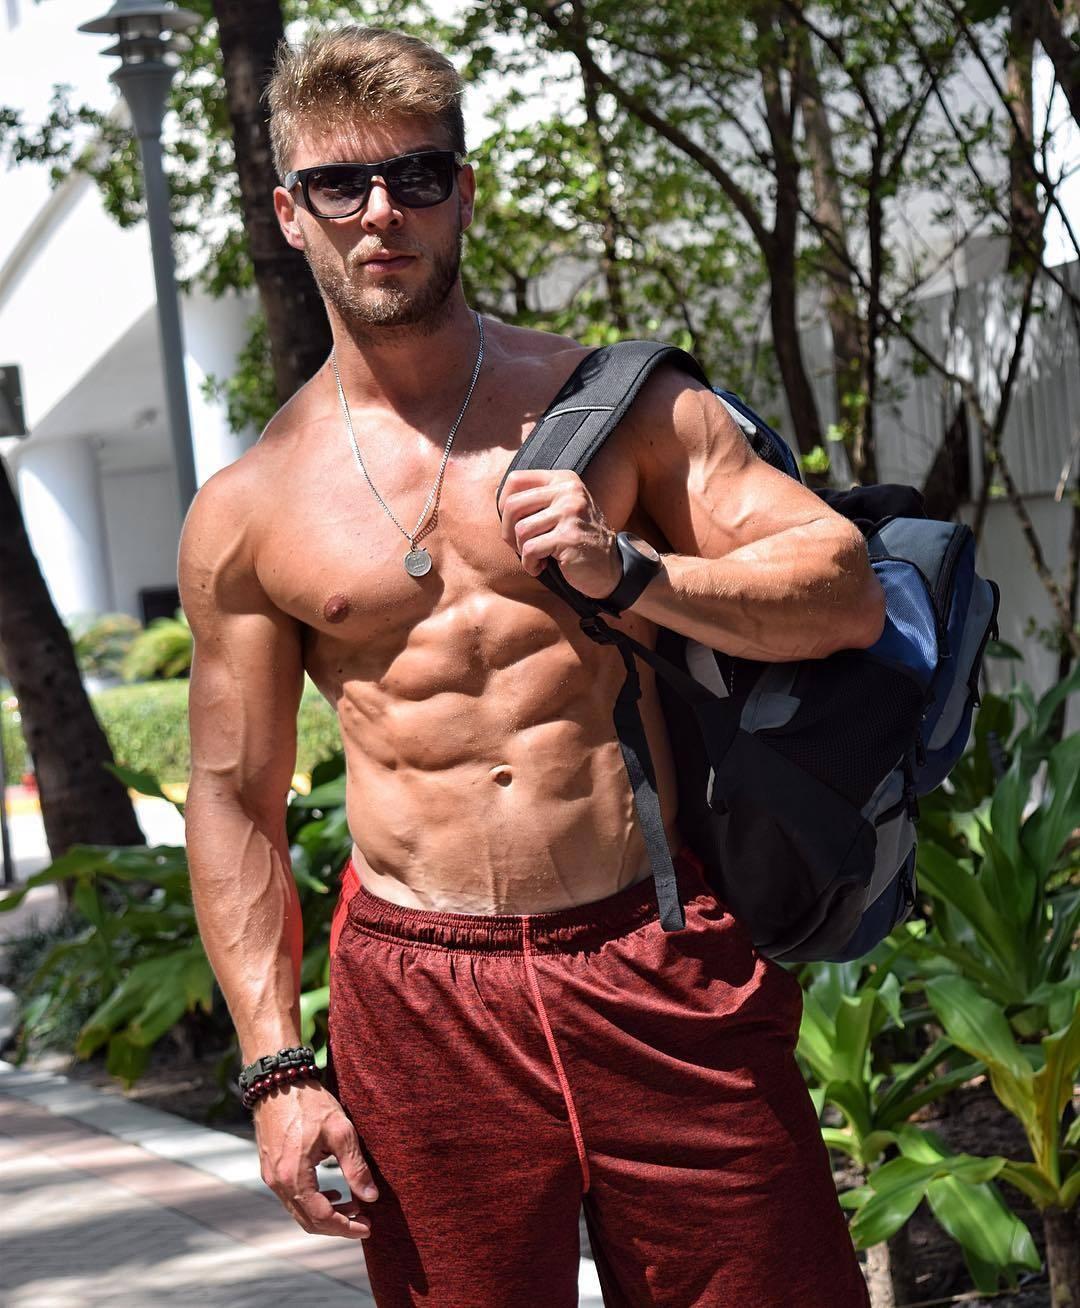 real-buff-muscled-man-armando-fogaca